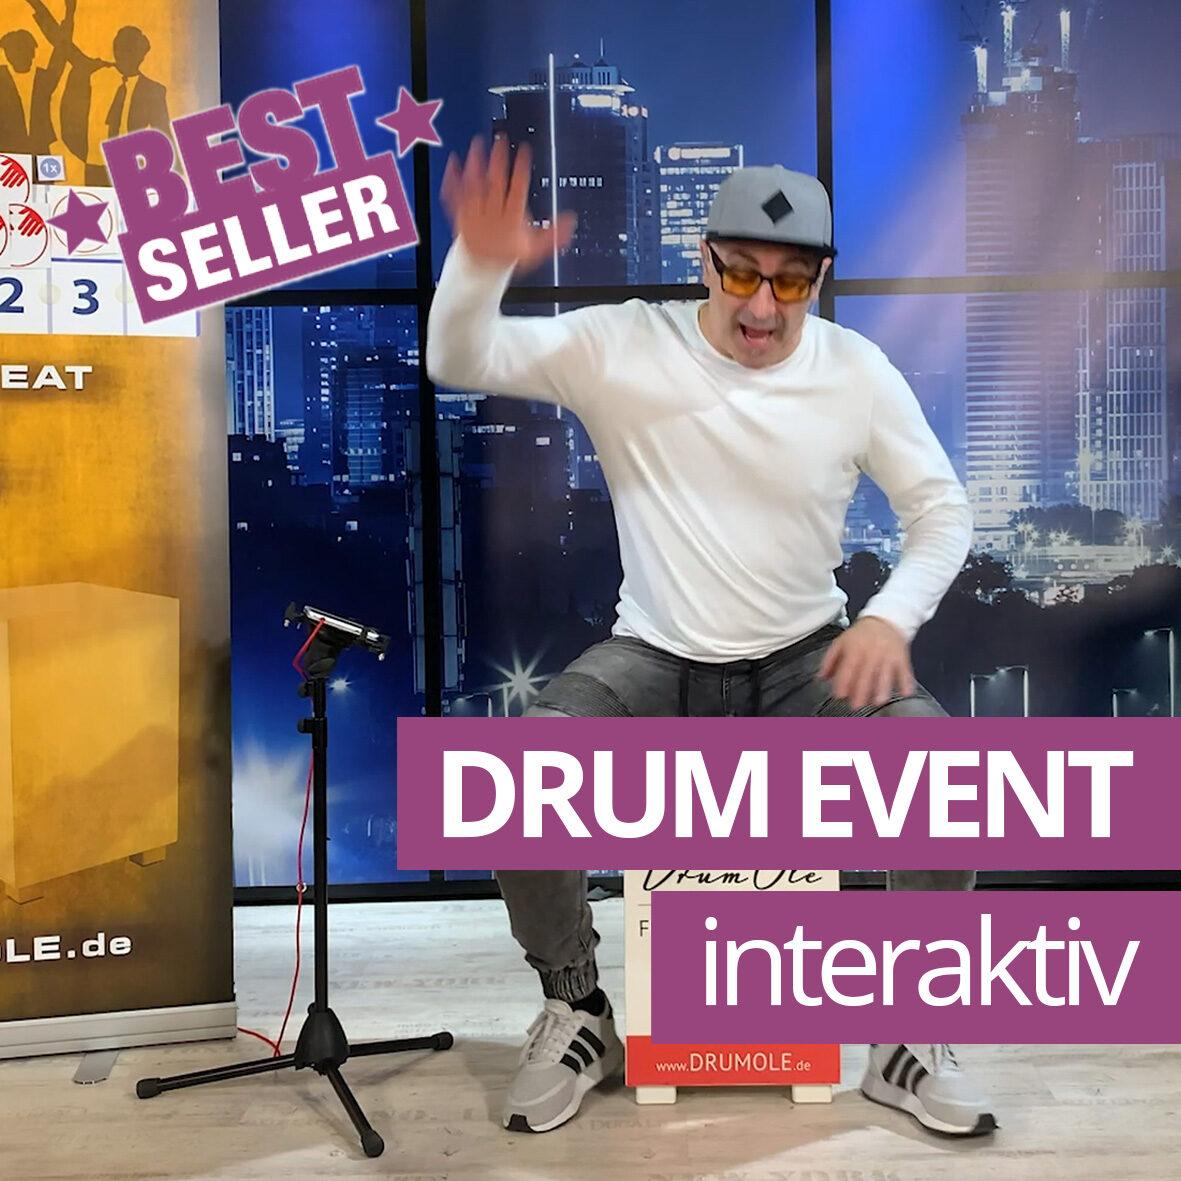 Online-Drumevent-09